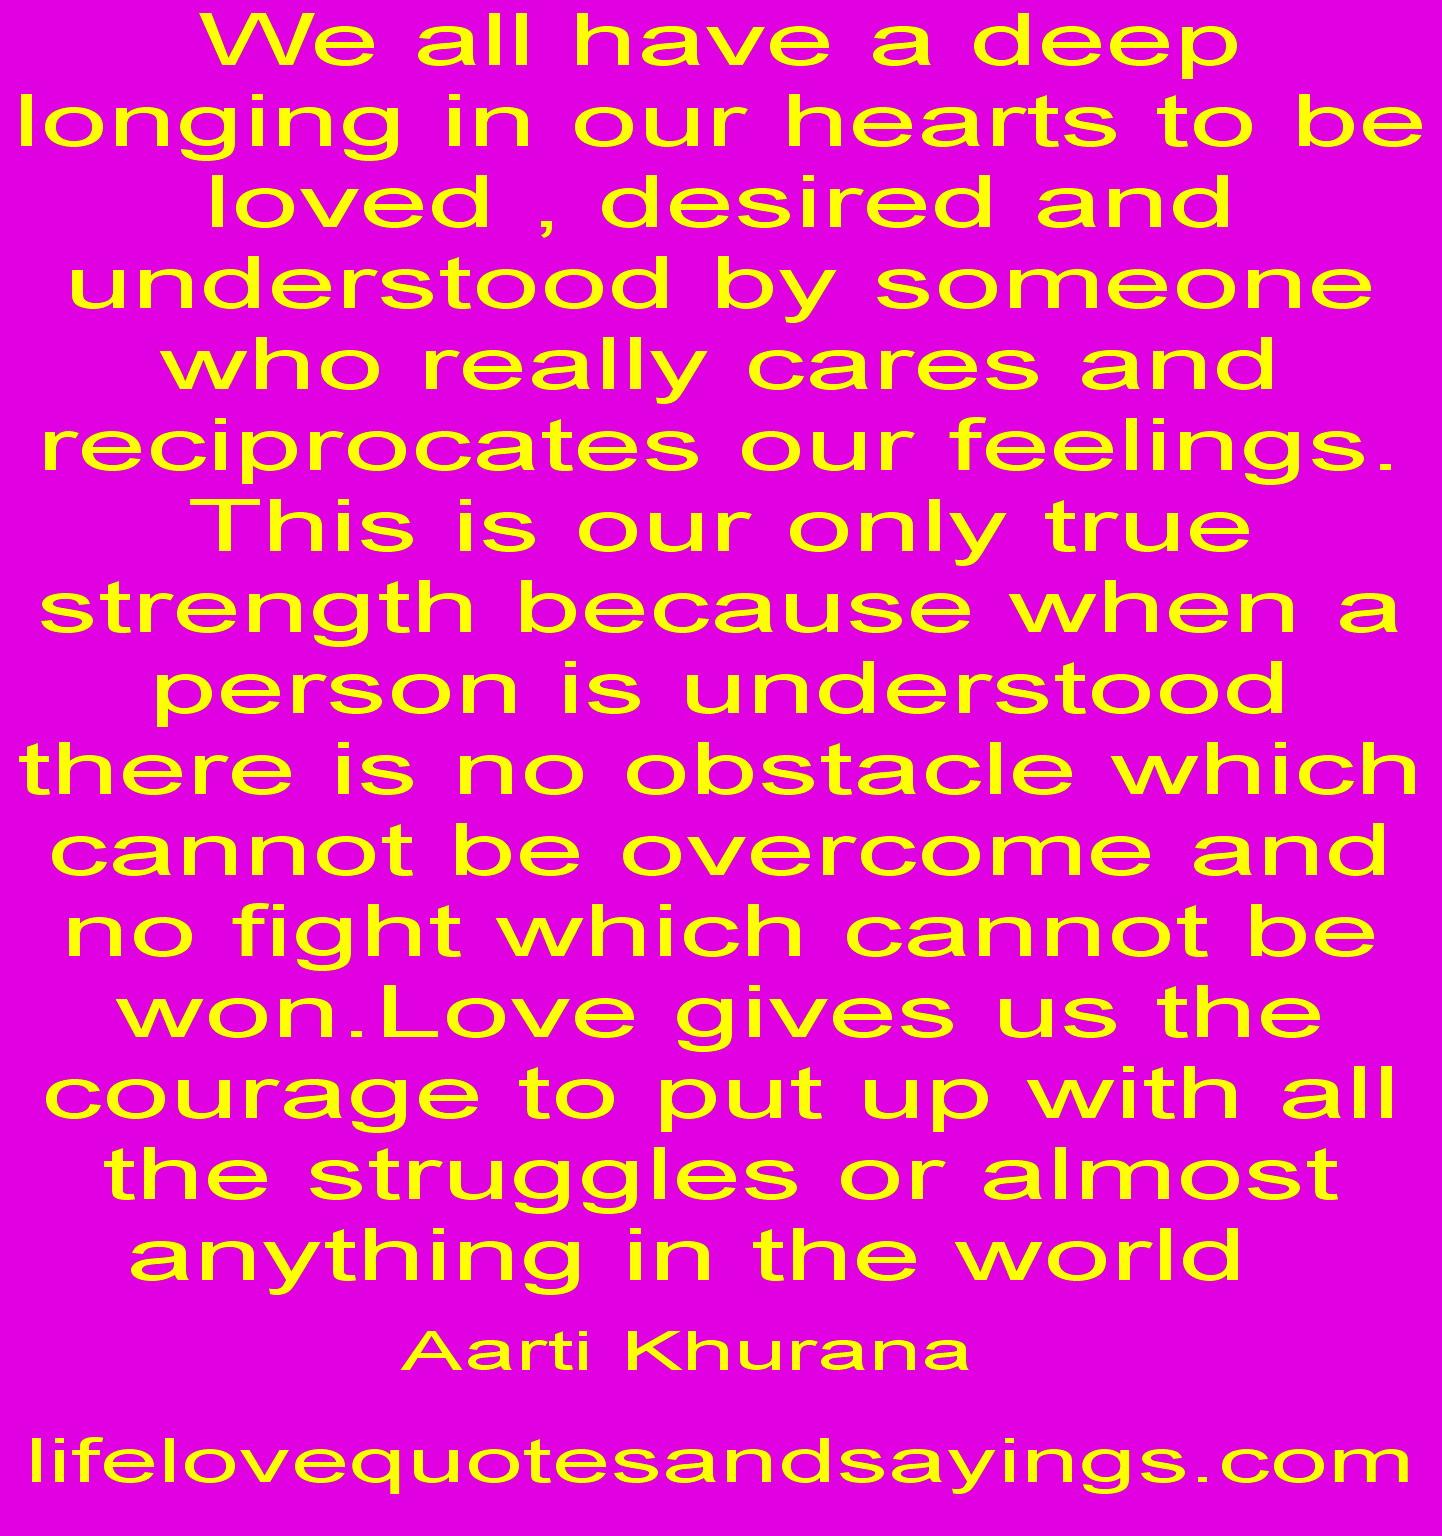 Quotes About Love: True Deep Love Quotes. QuotesGram